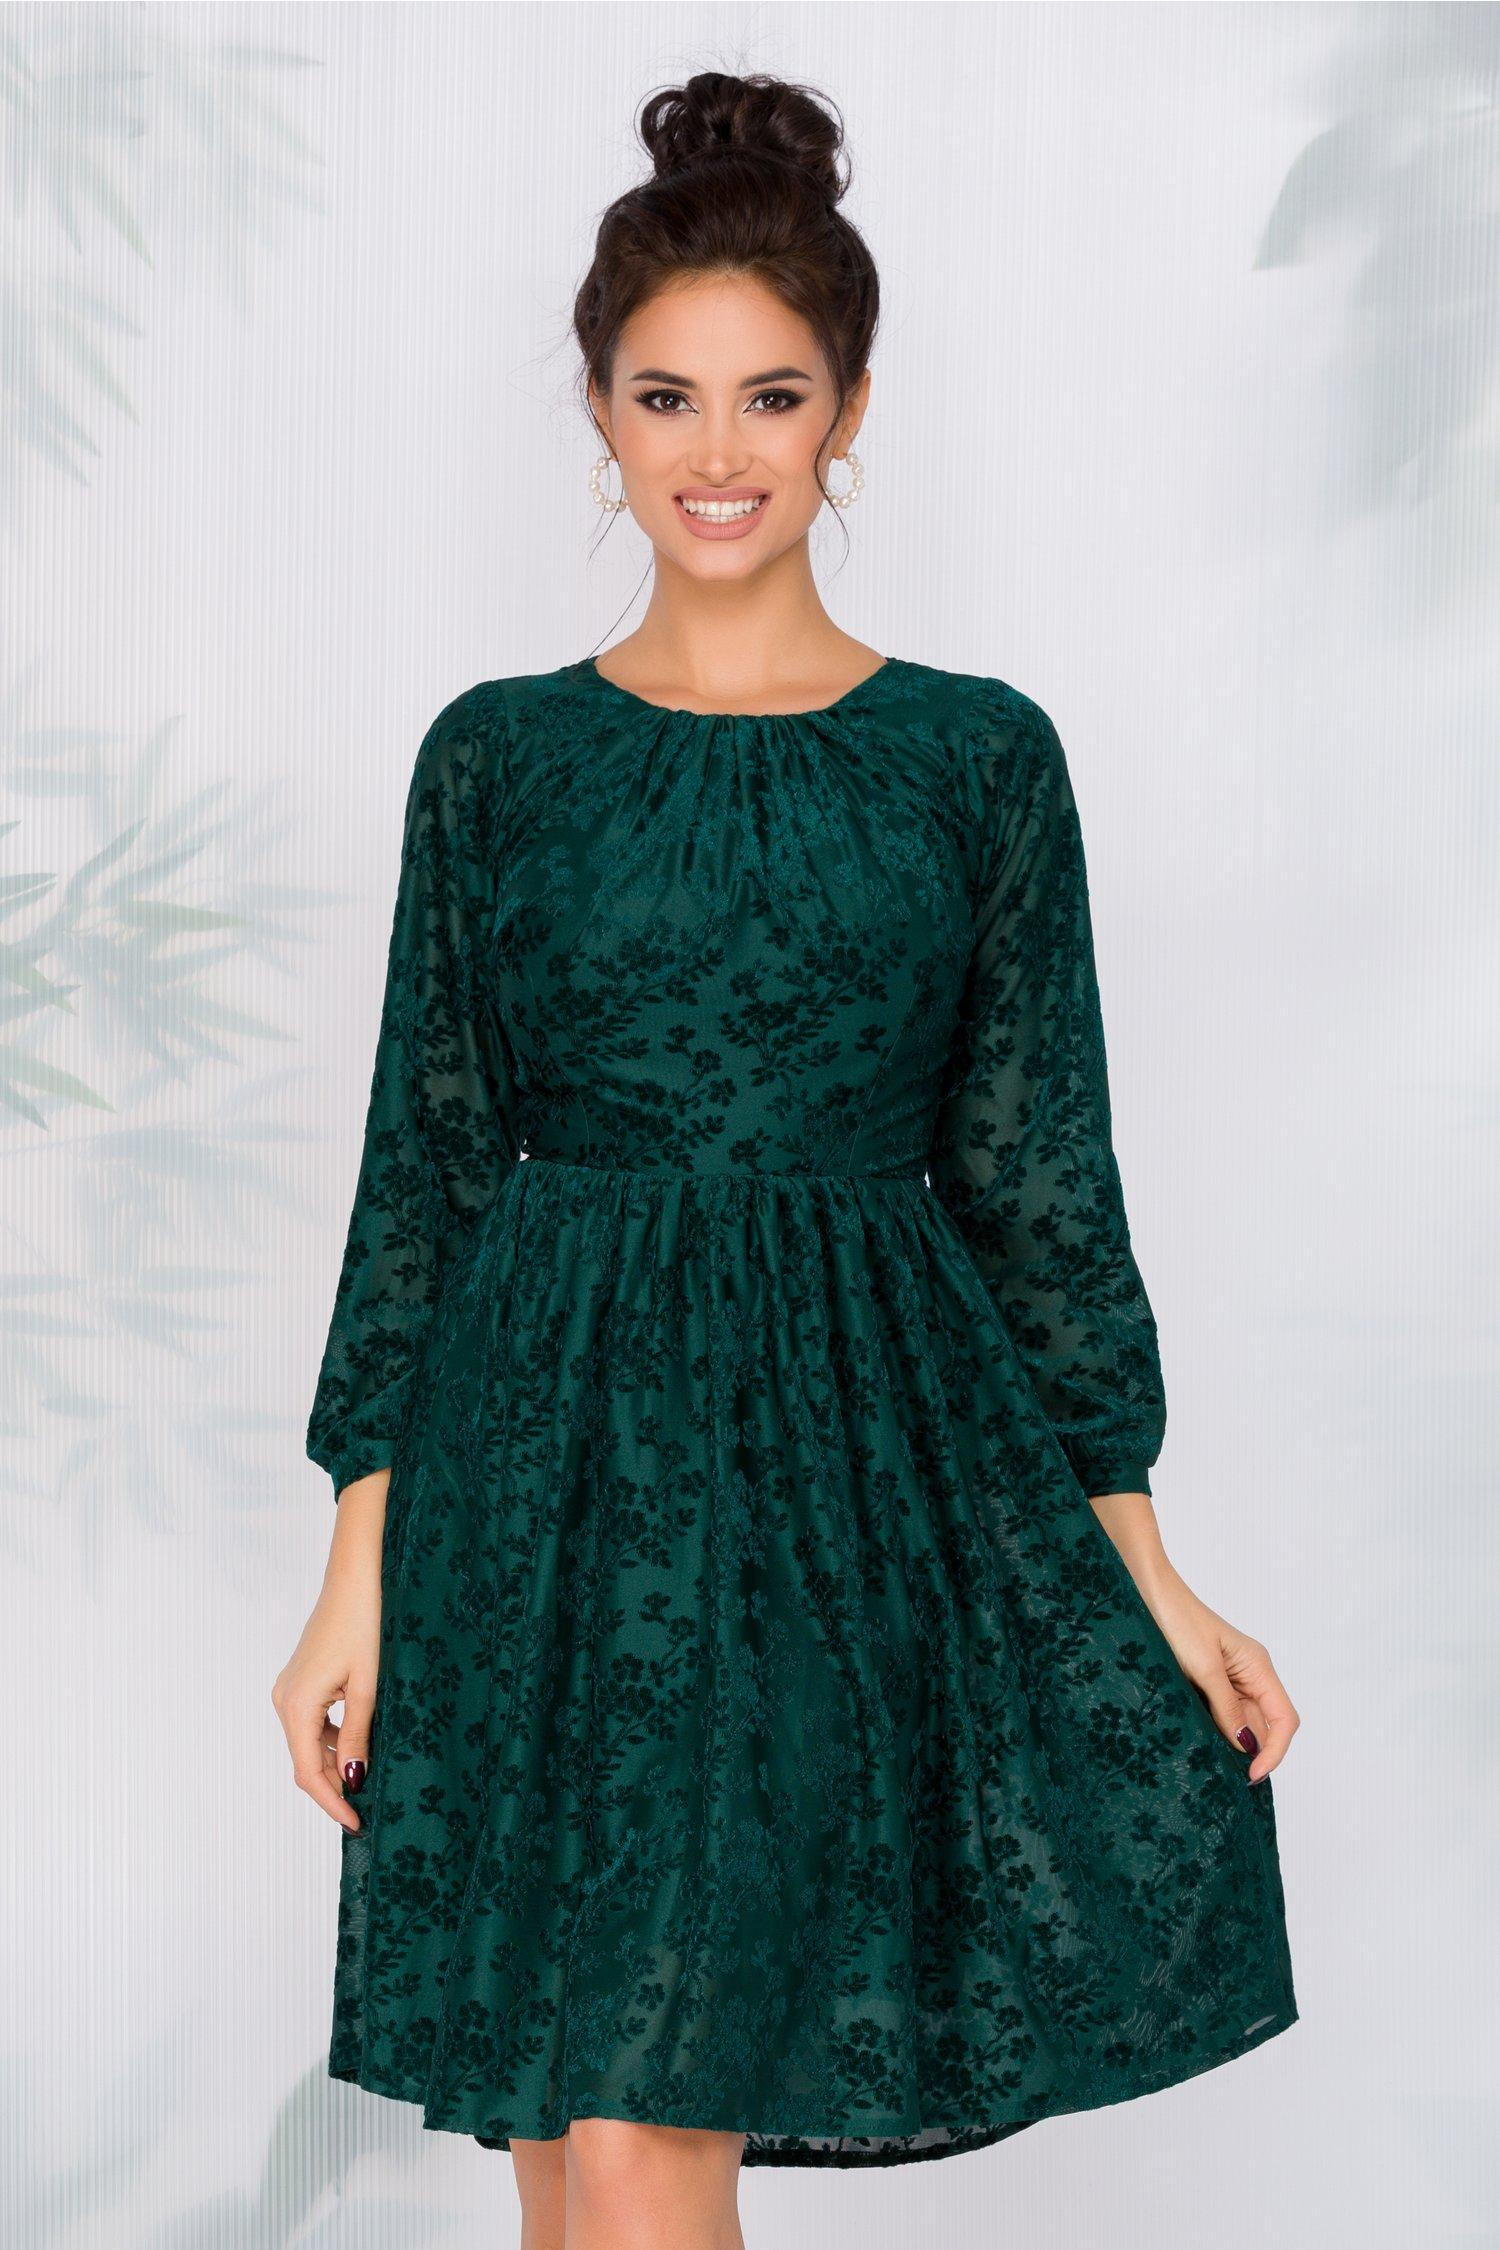 Rochie Moze verde cu insertii florale catifelate